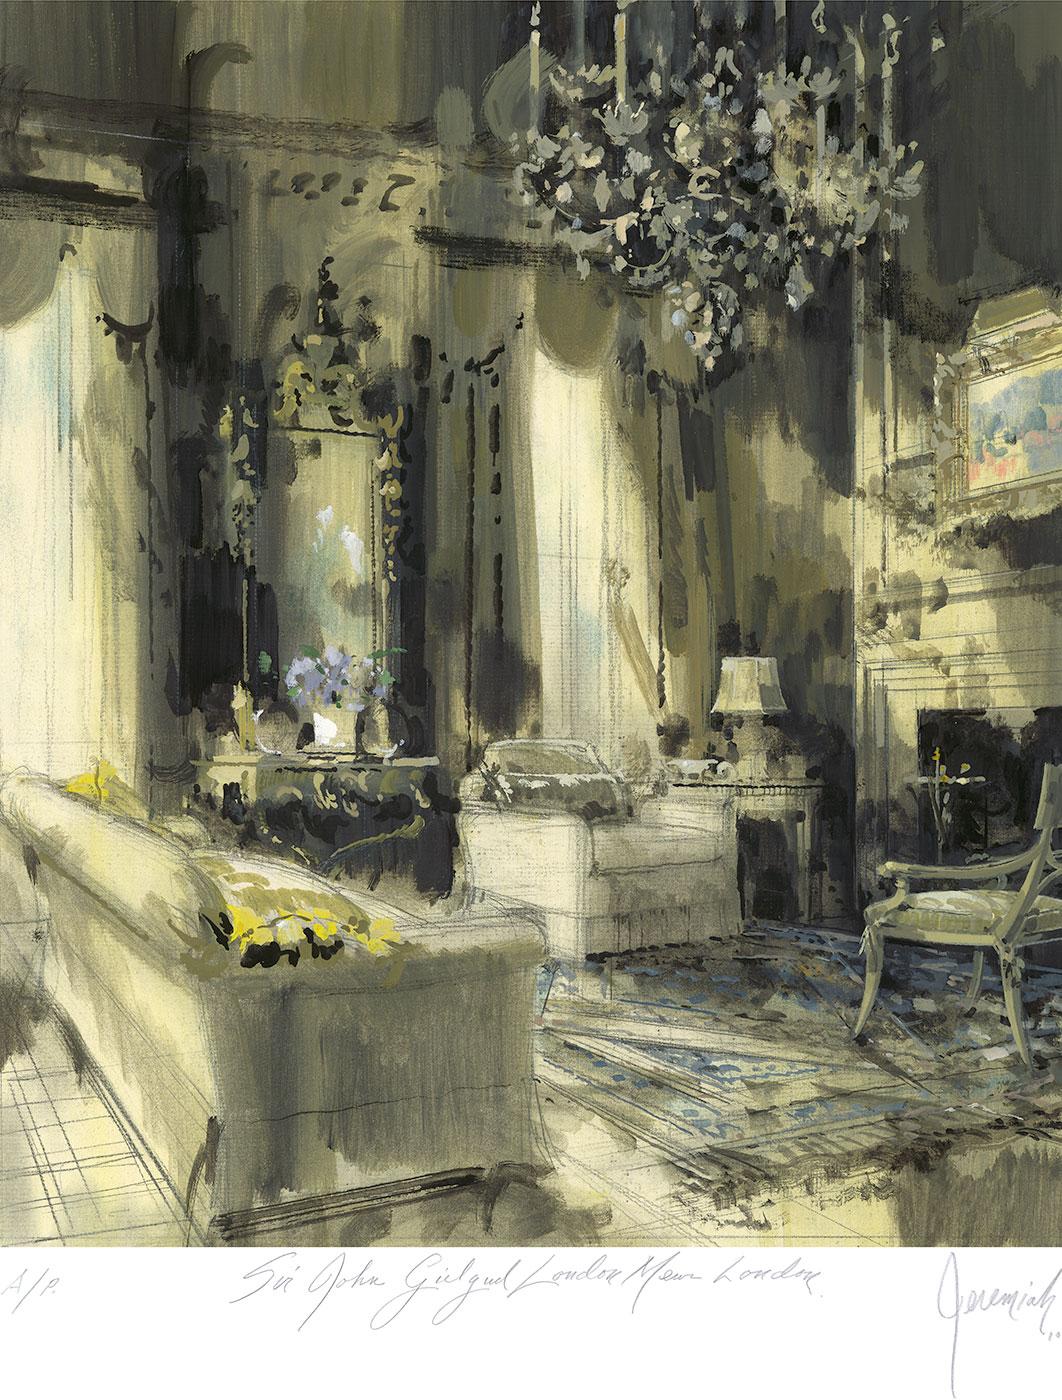 Sir John Gielgud's sitting room